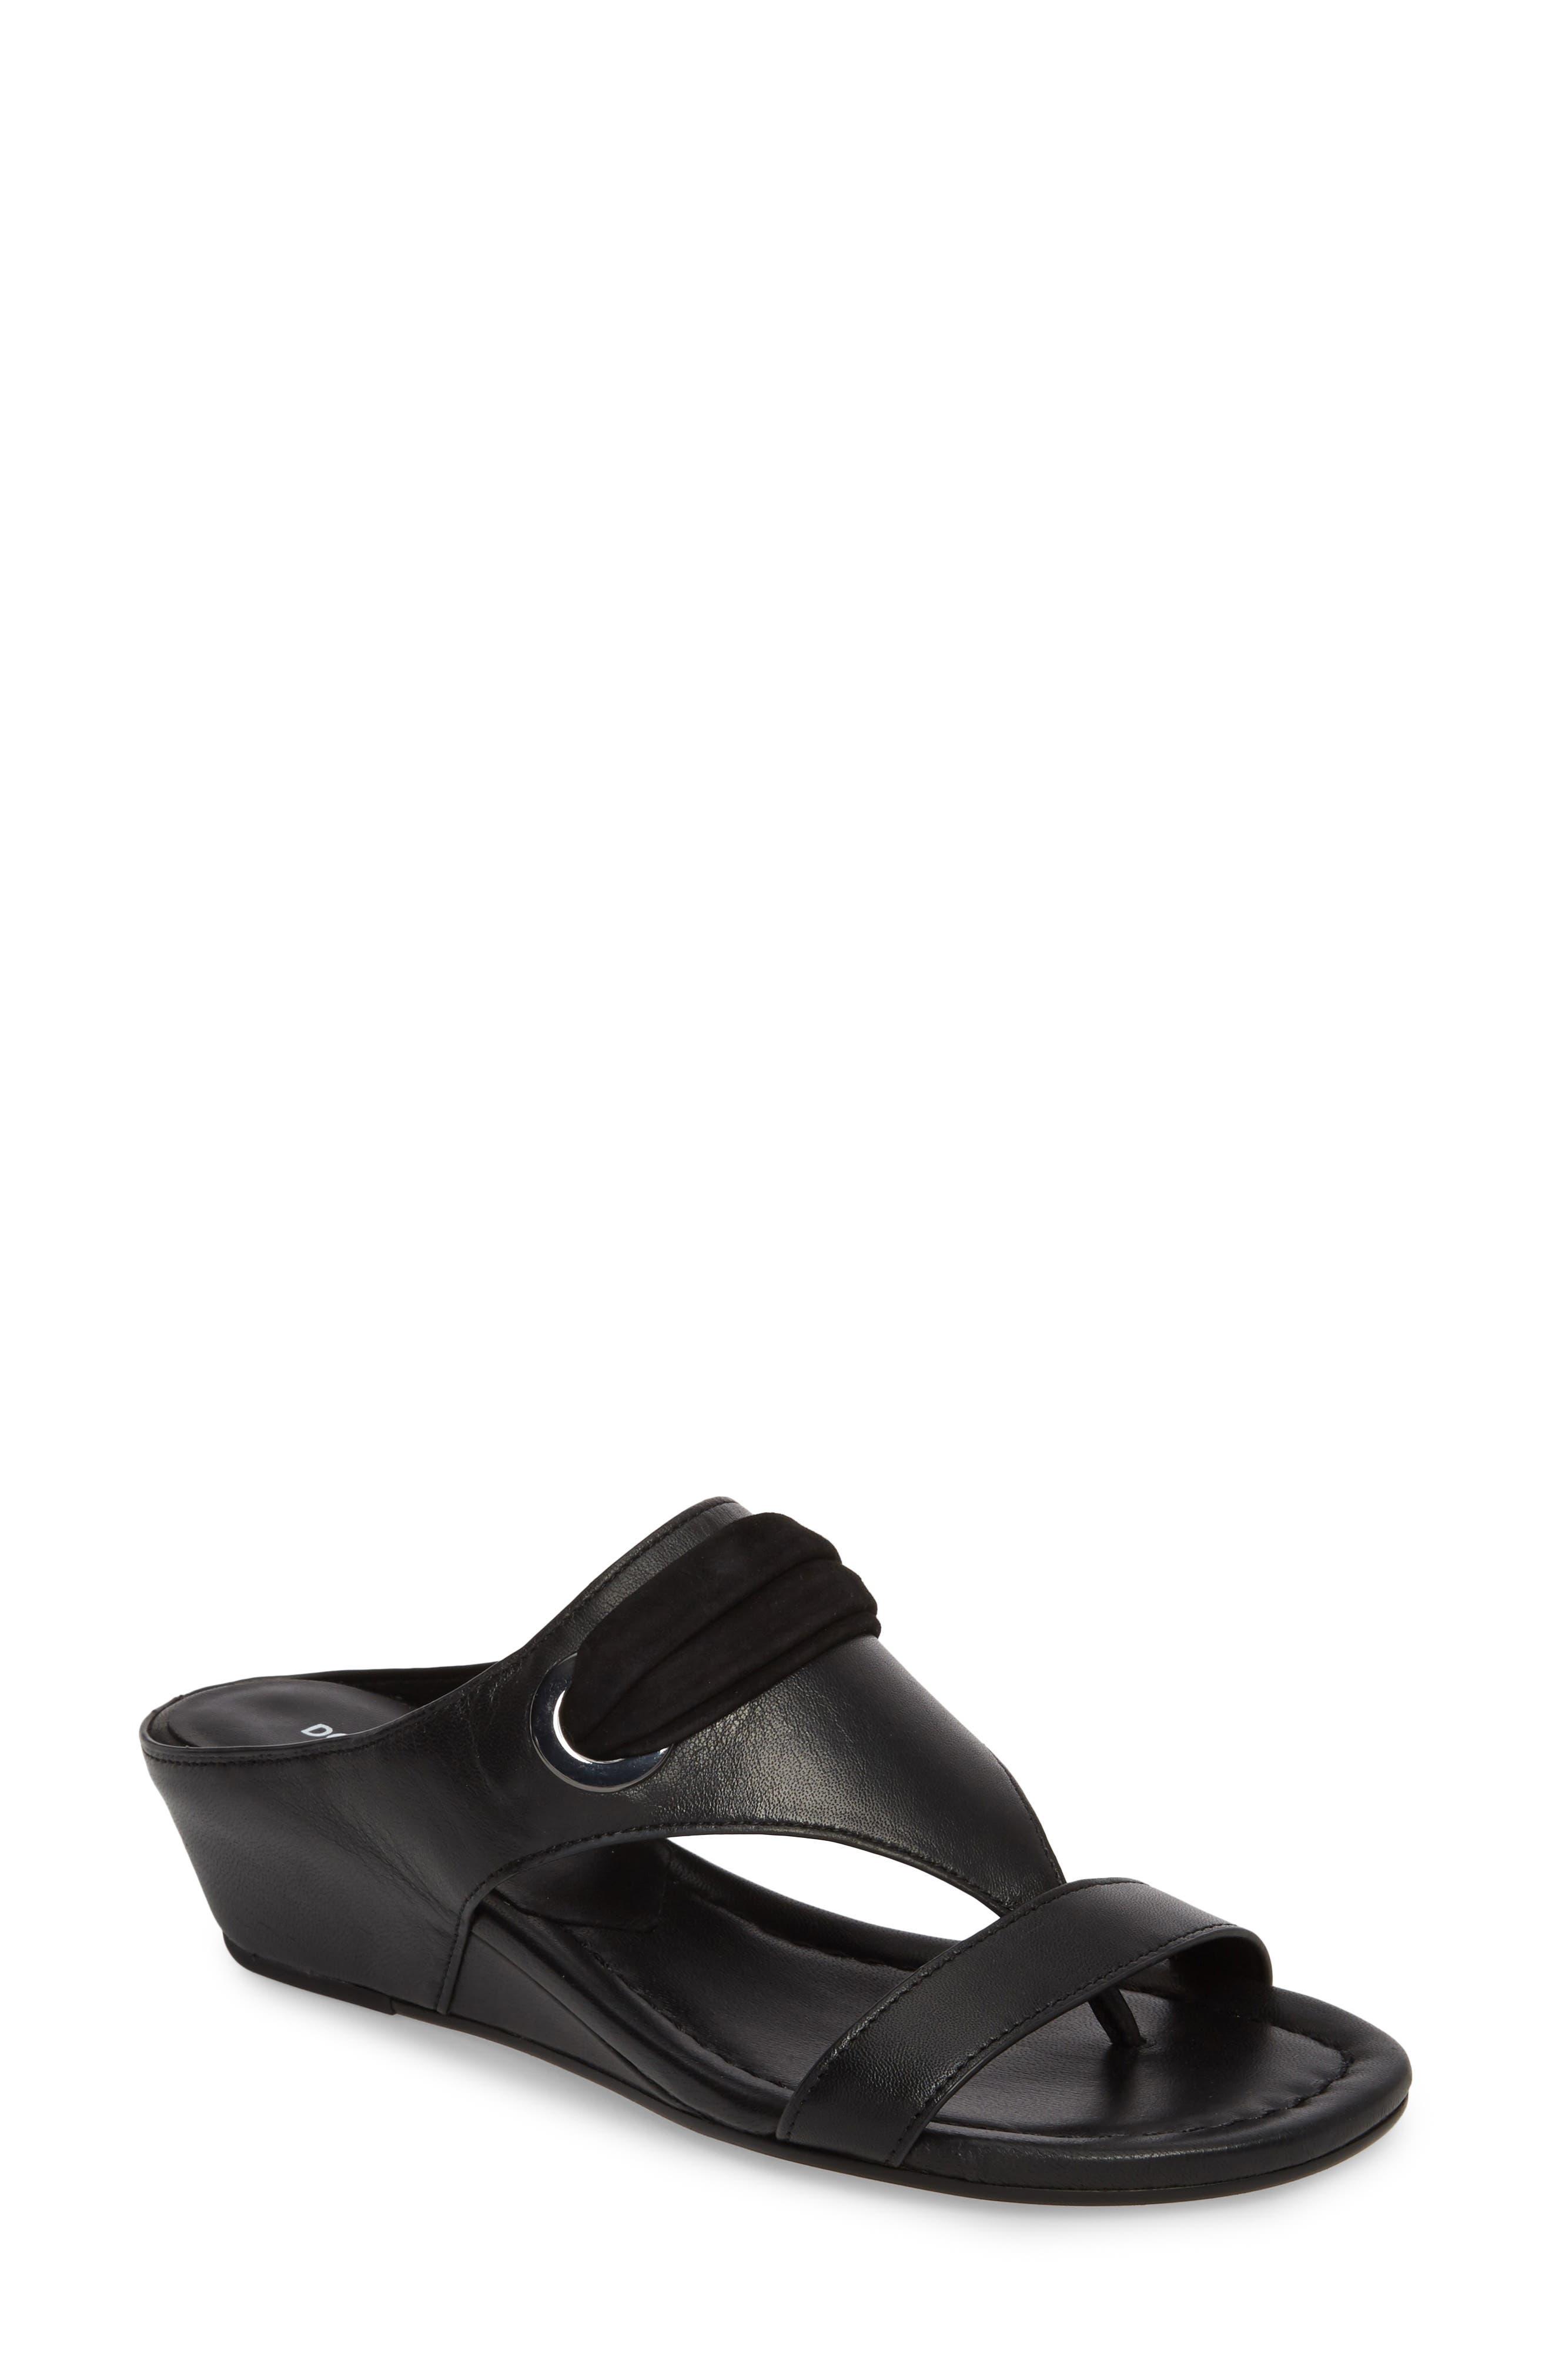 Dionne Wedge Sandal,                             Main thumbnail 1, color,                             Black Leather